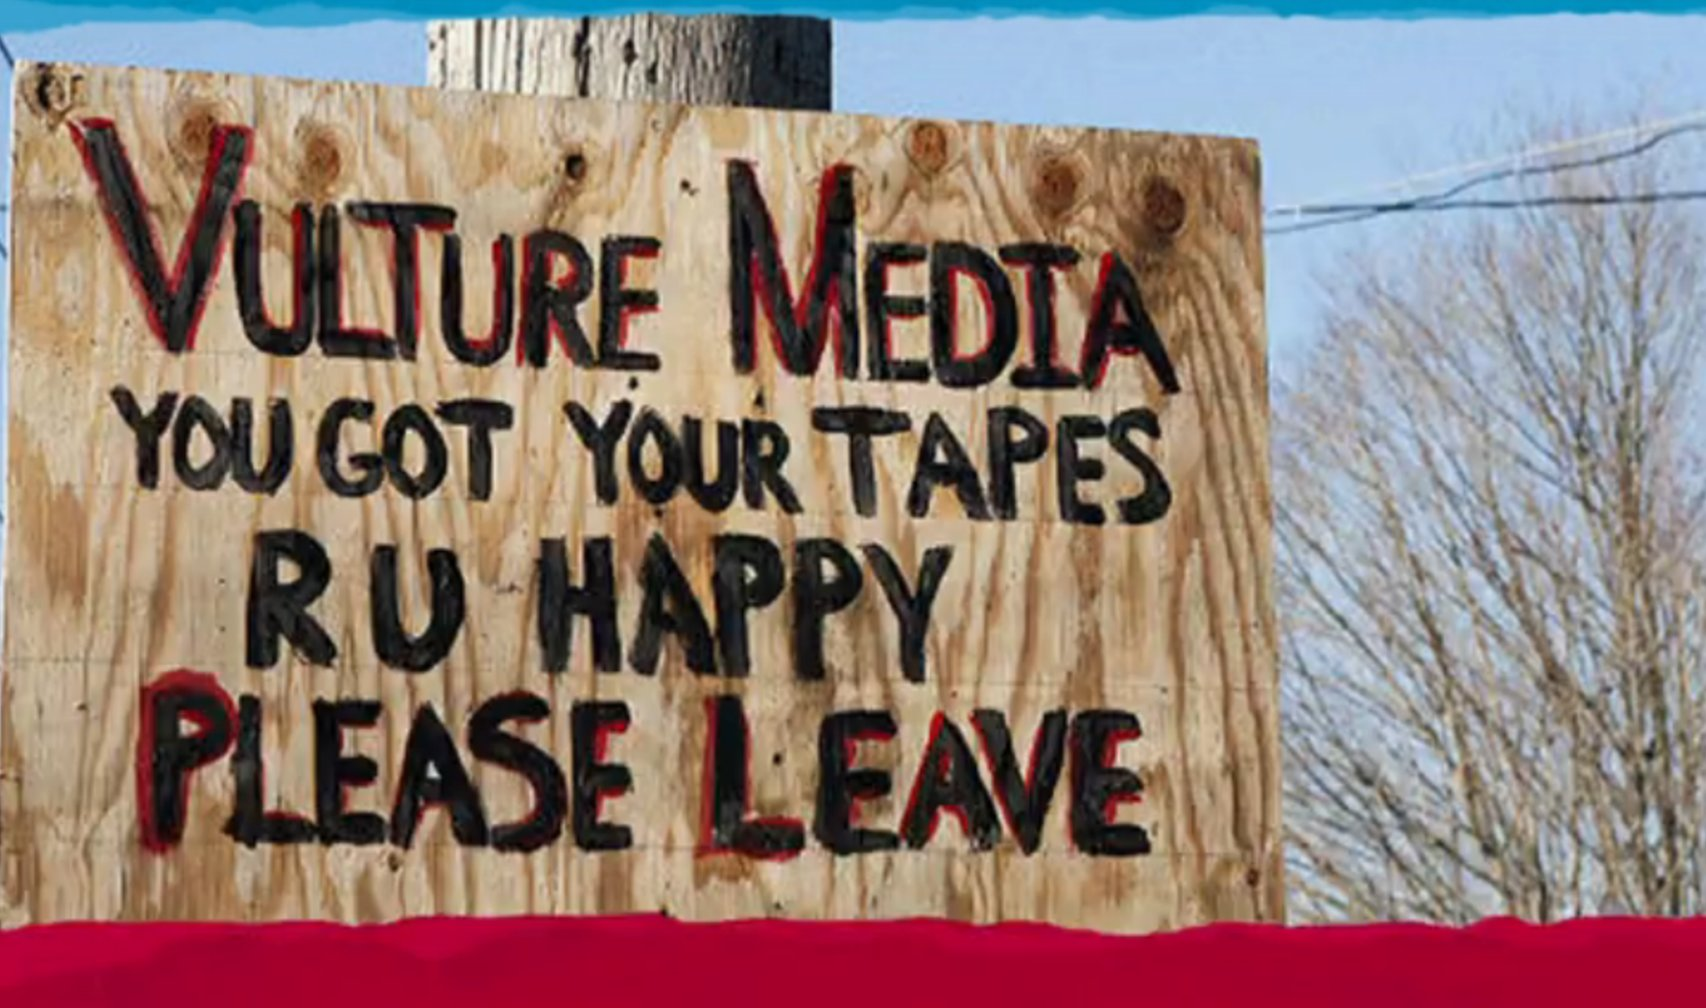 vulture media